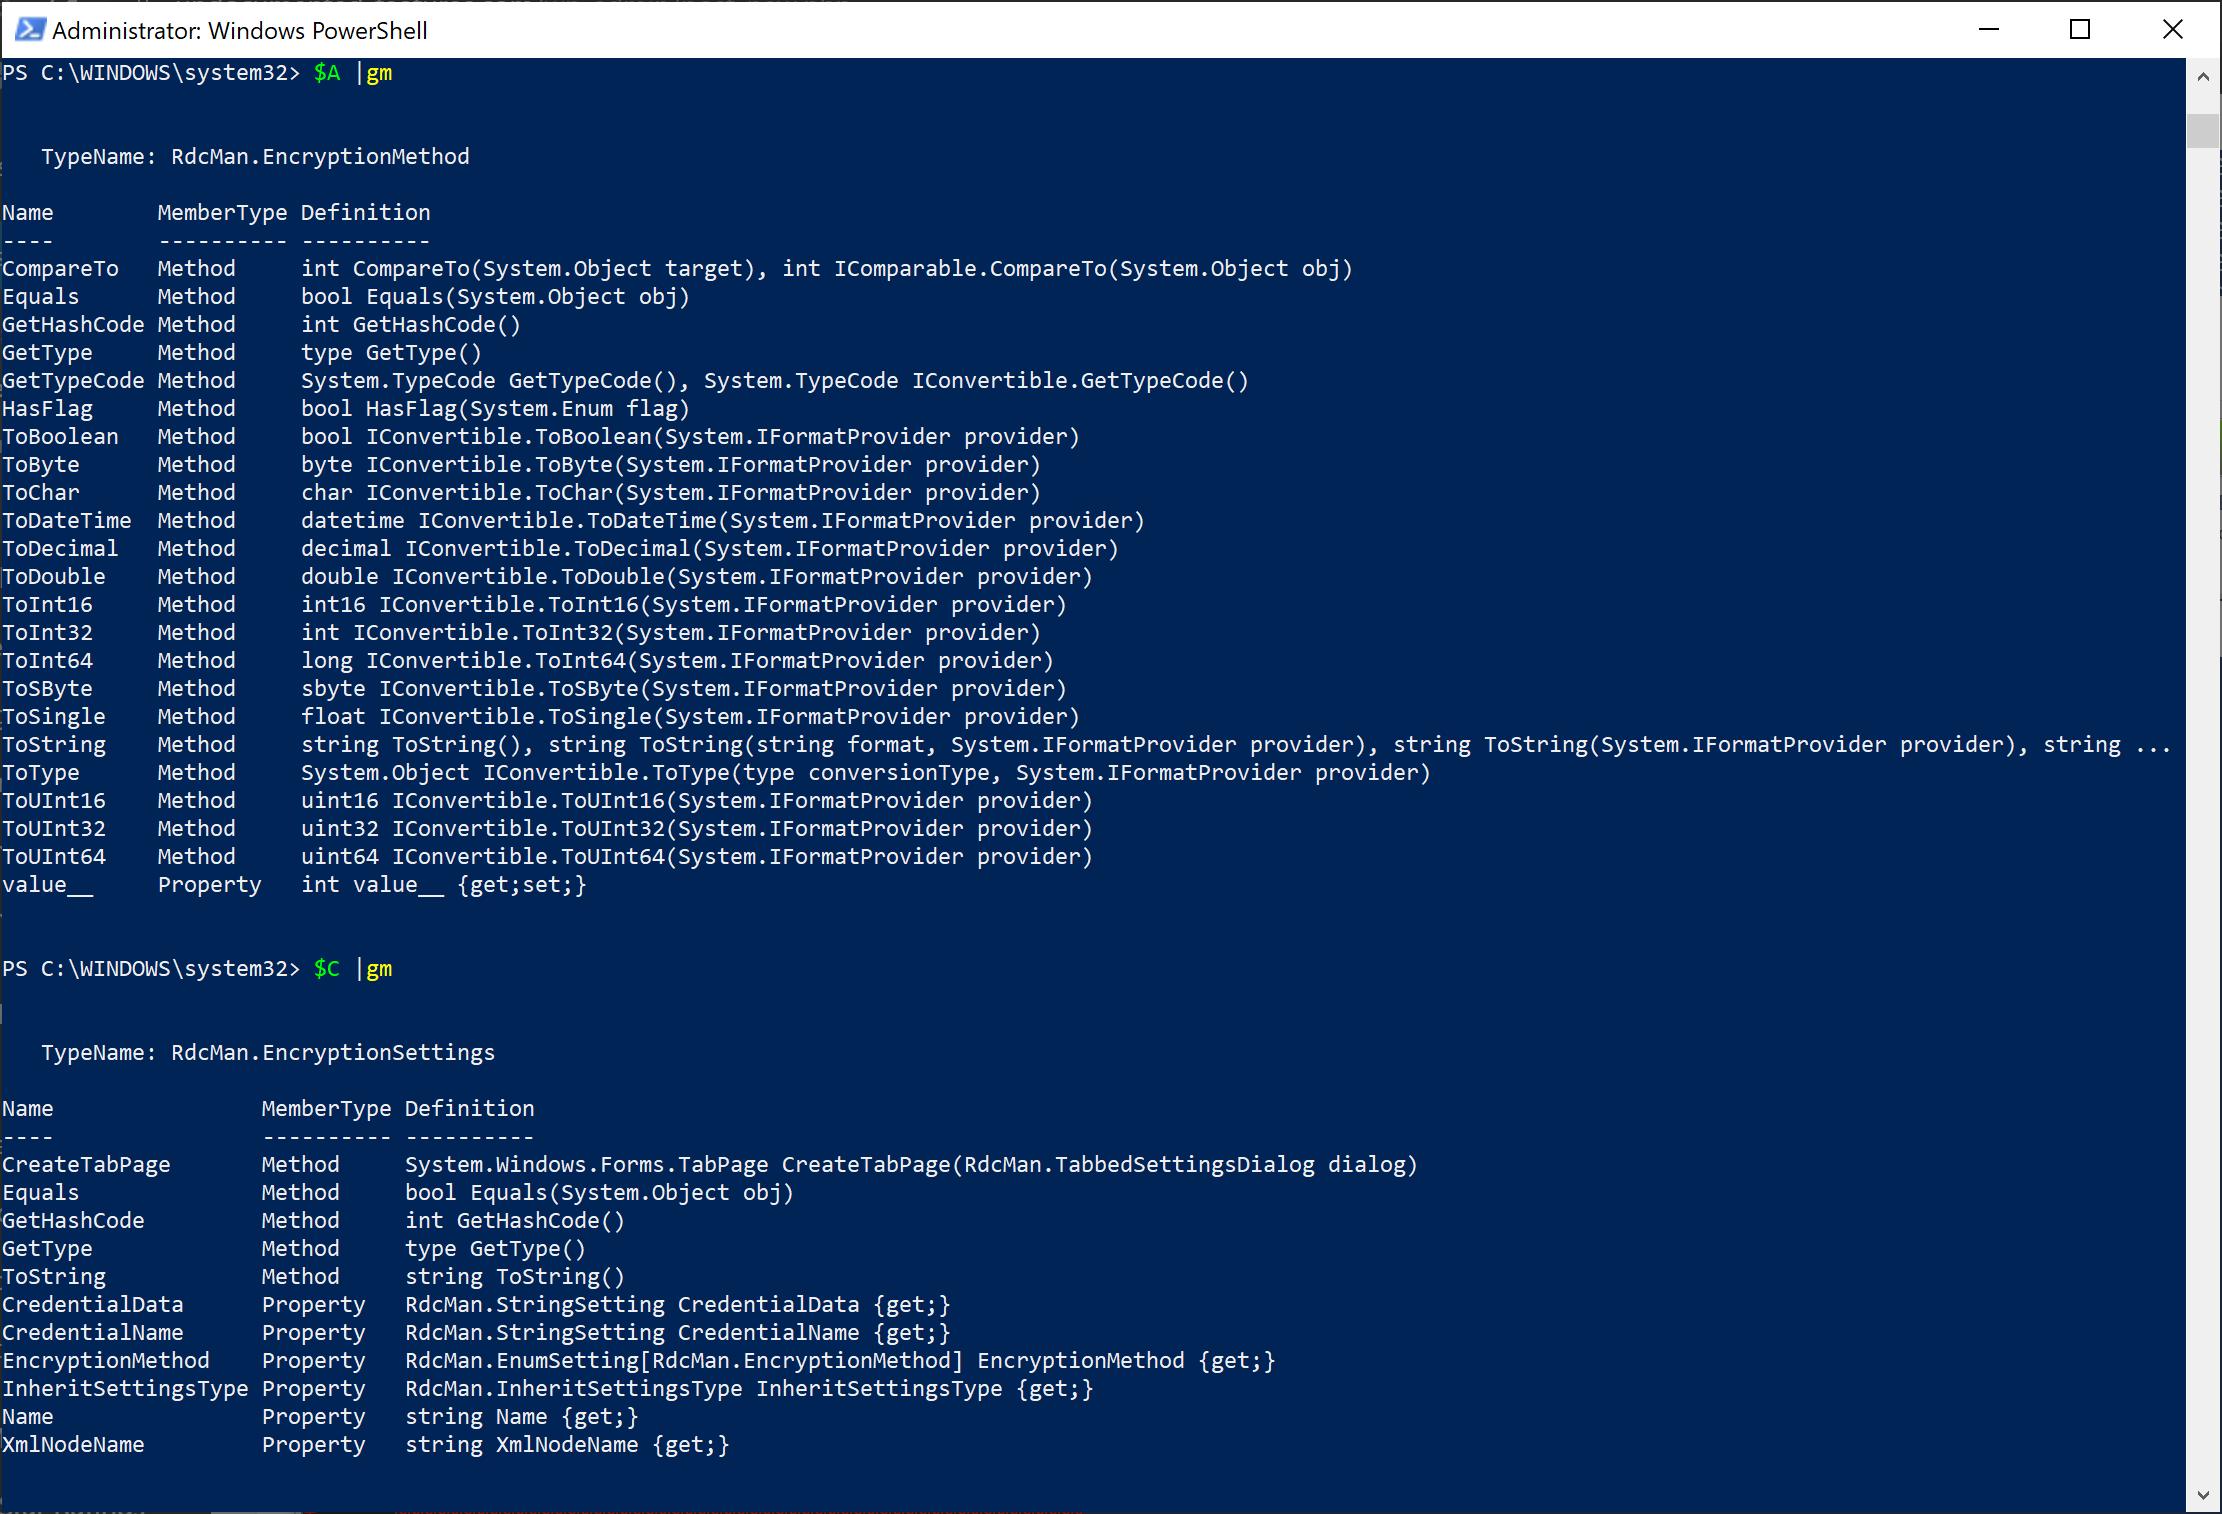 Decrypting Credentials Stored in Remote Desktop Connection Manager (RDCMan) .rdg